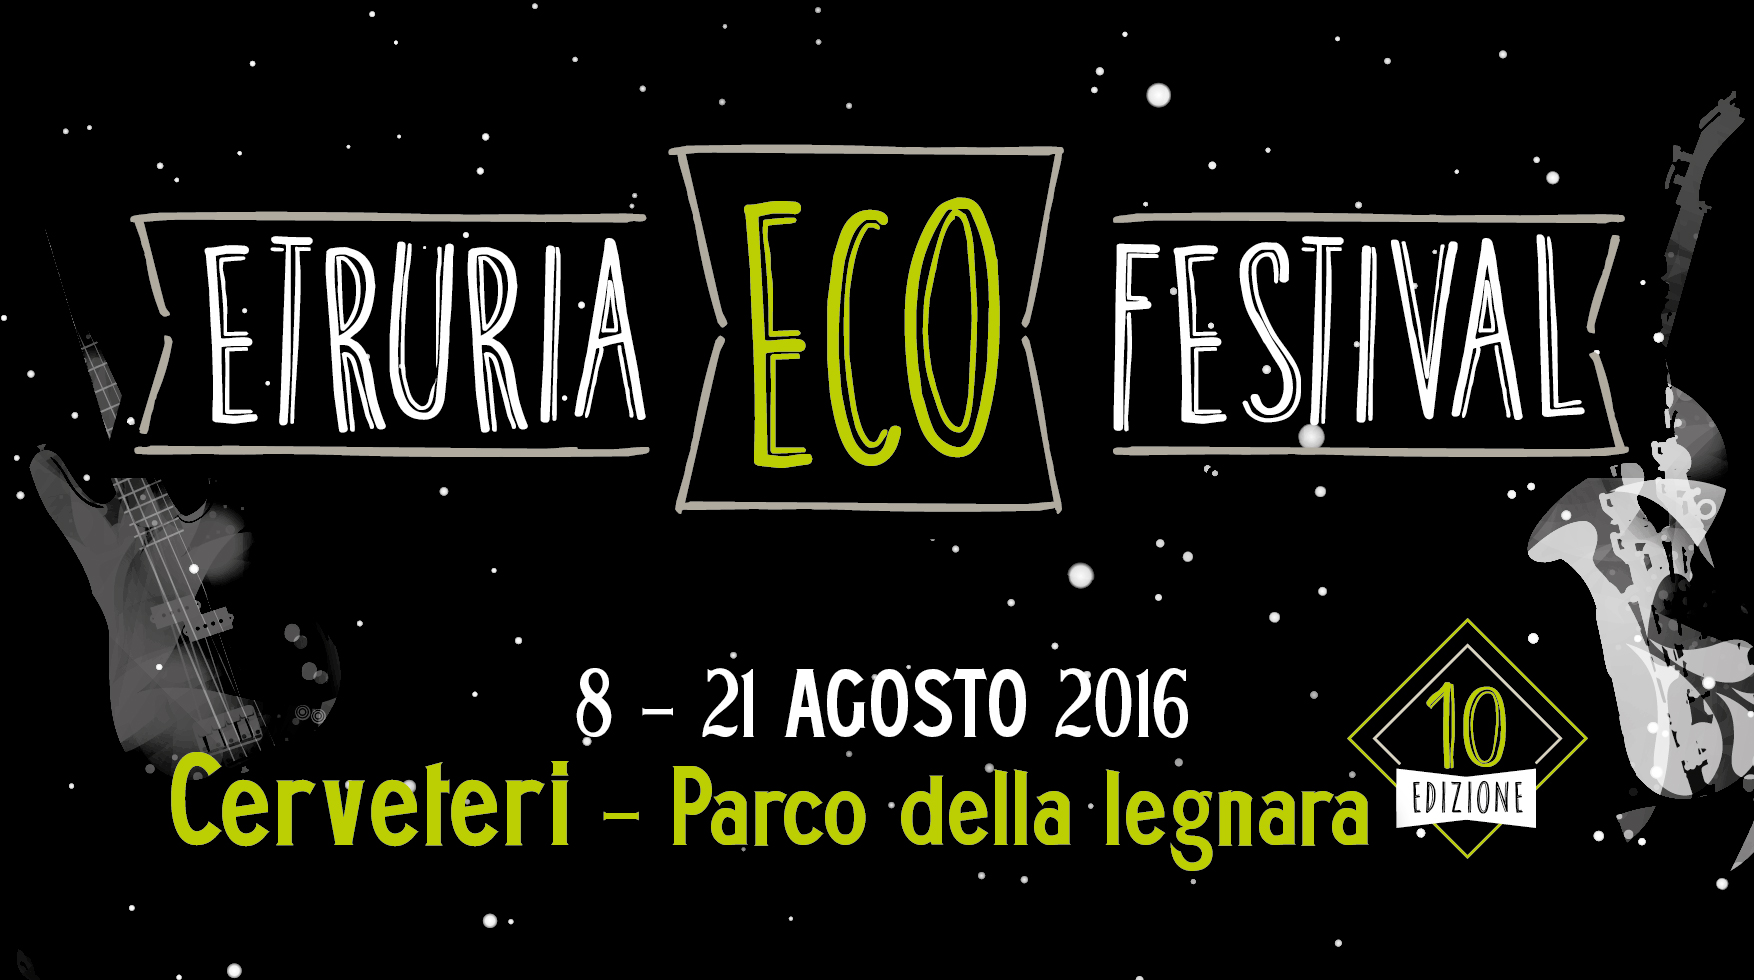 Ecofestival 2016